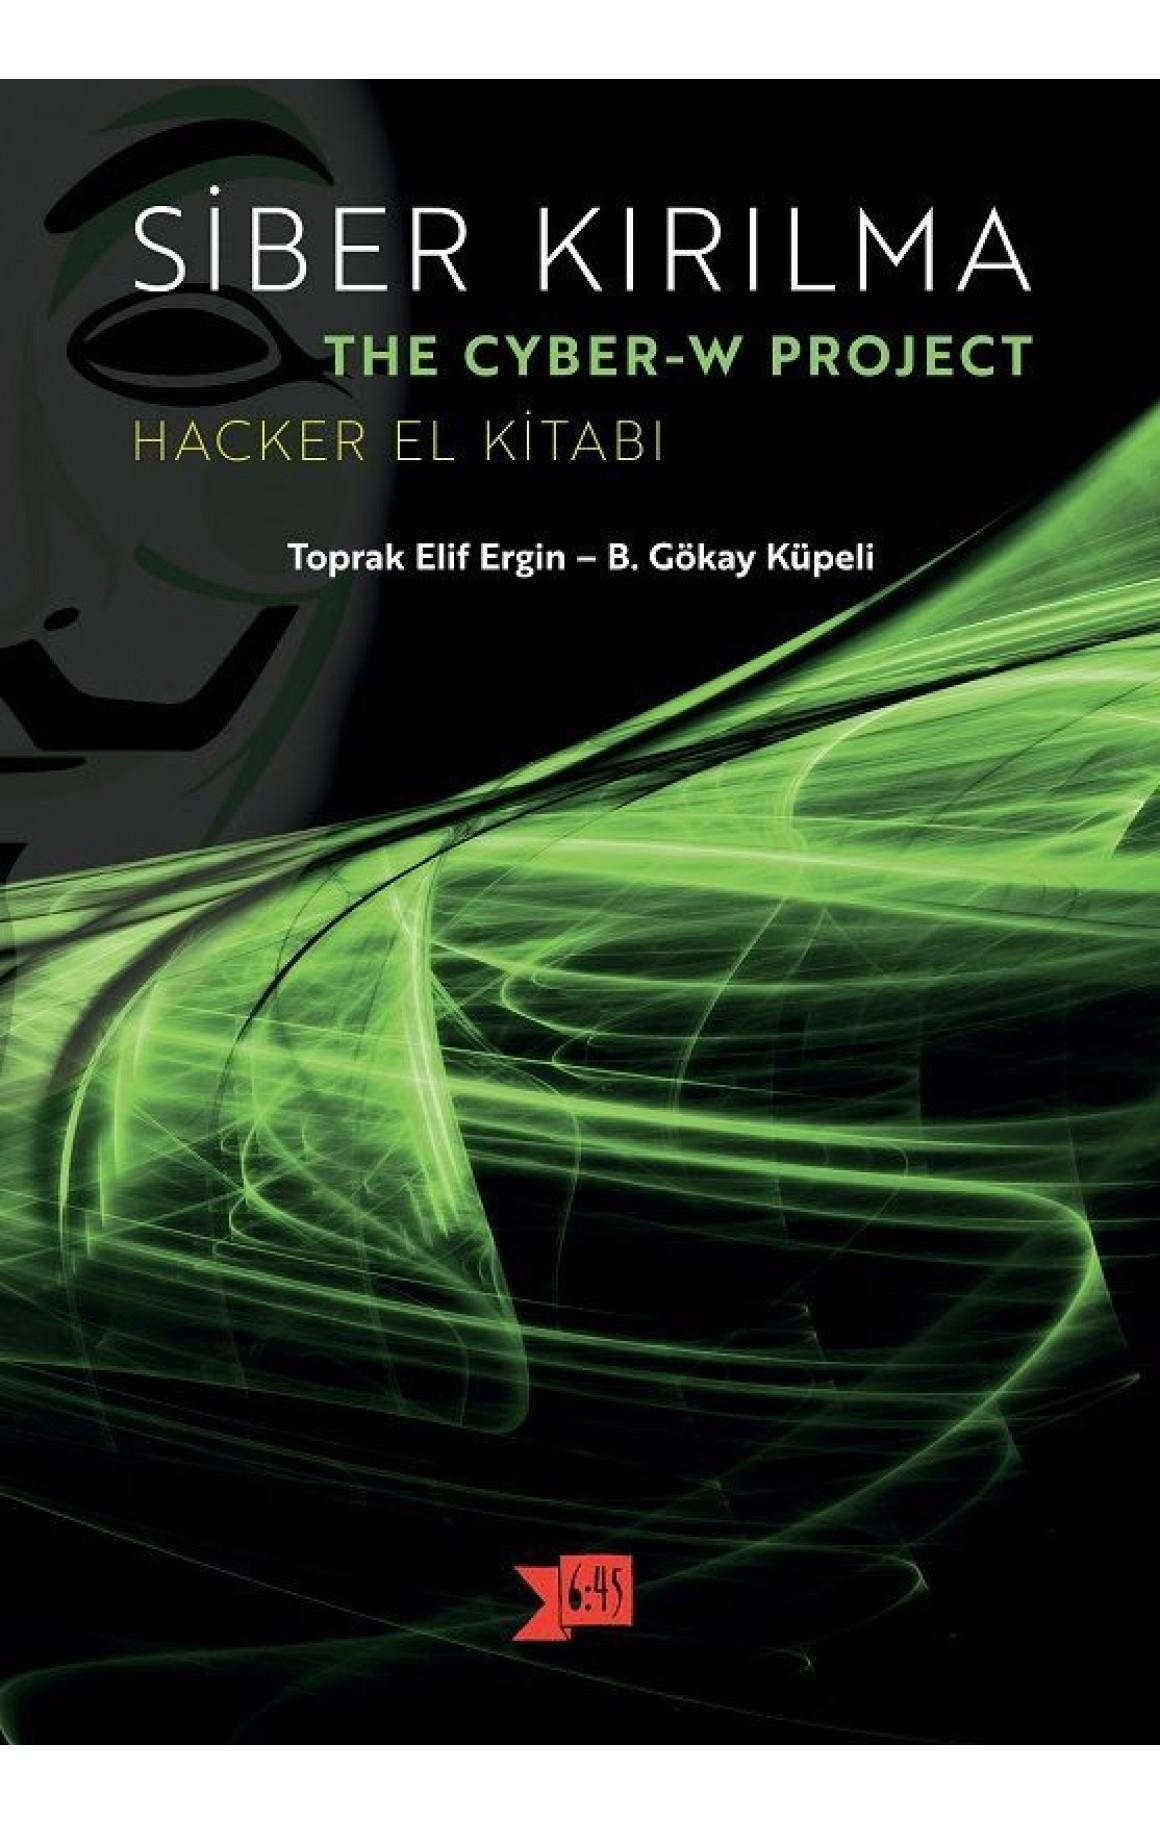 Siber Kırılma-Hacker El Kitabı